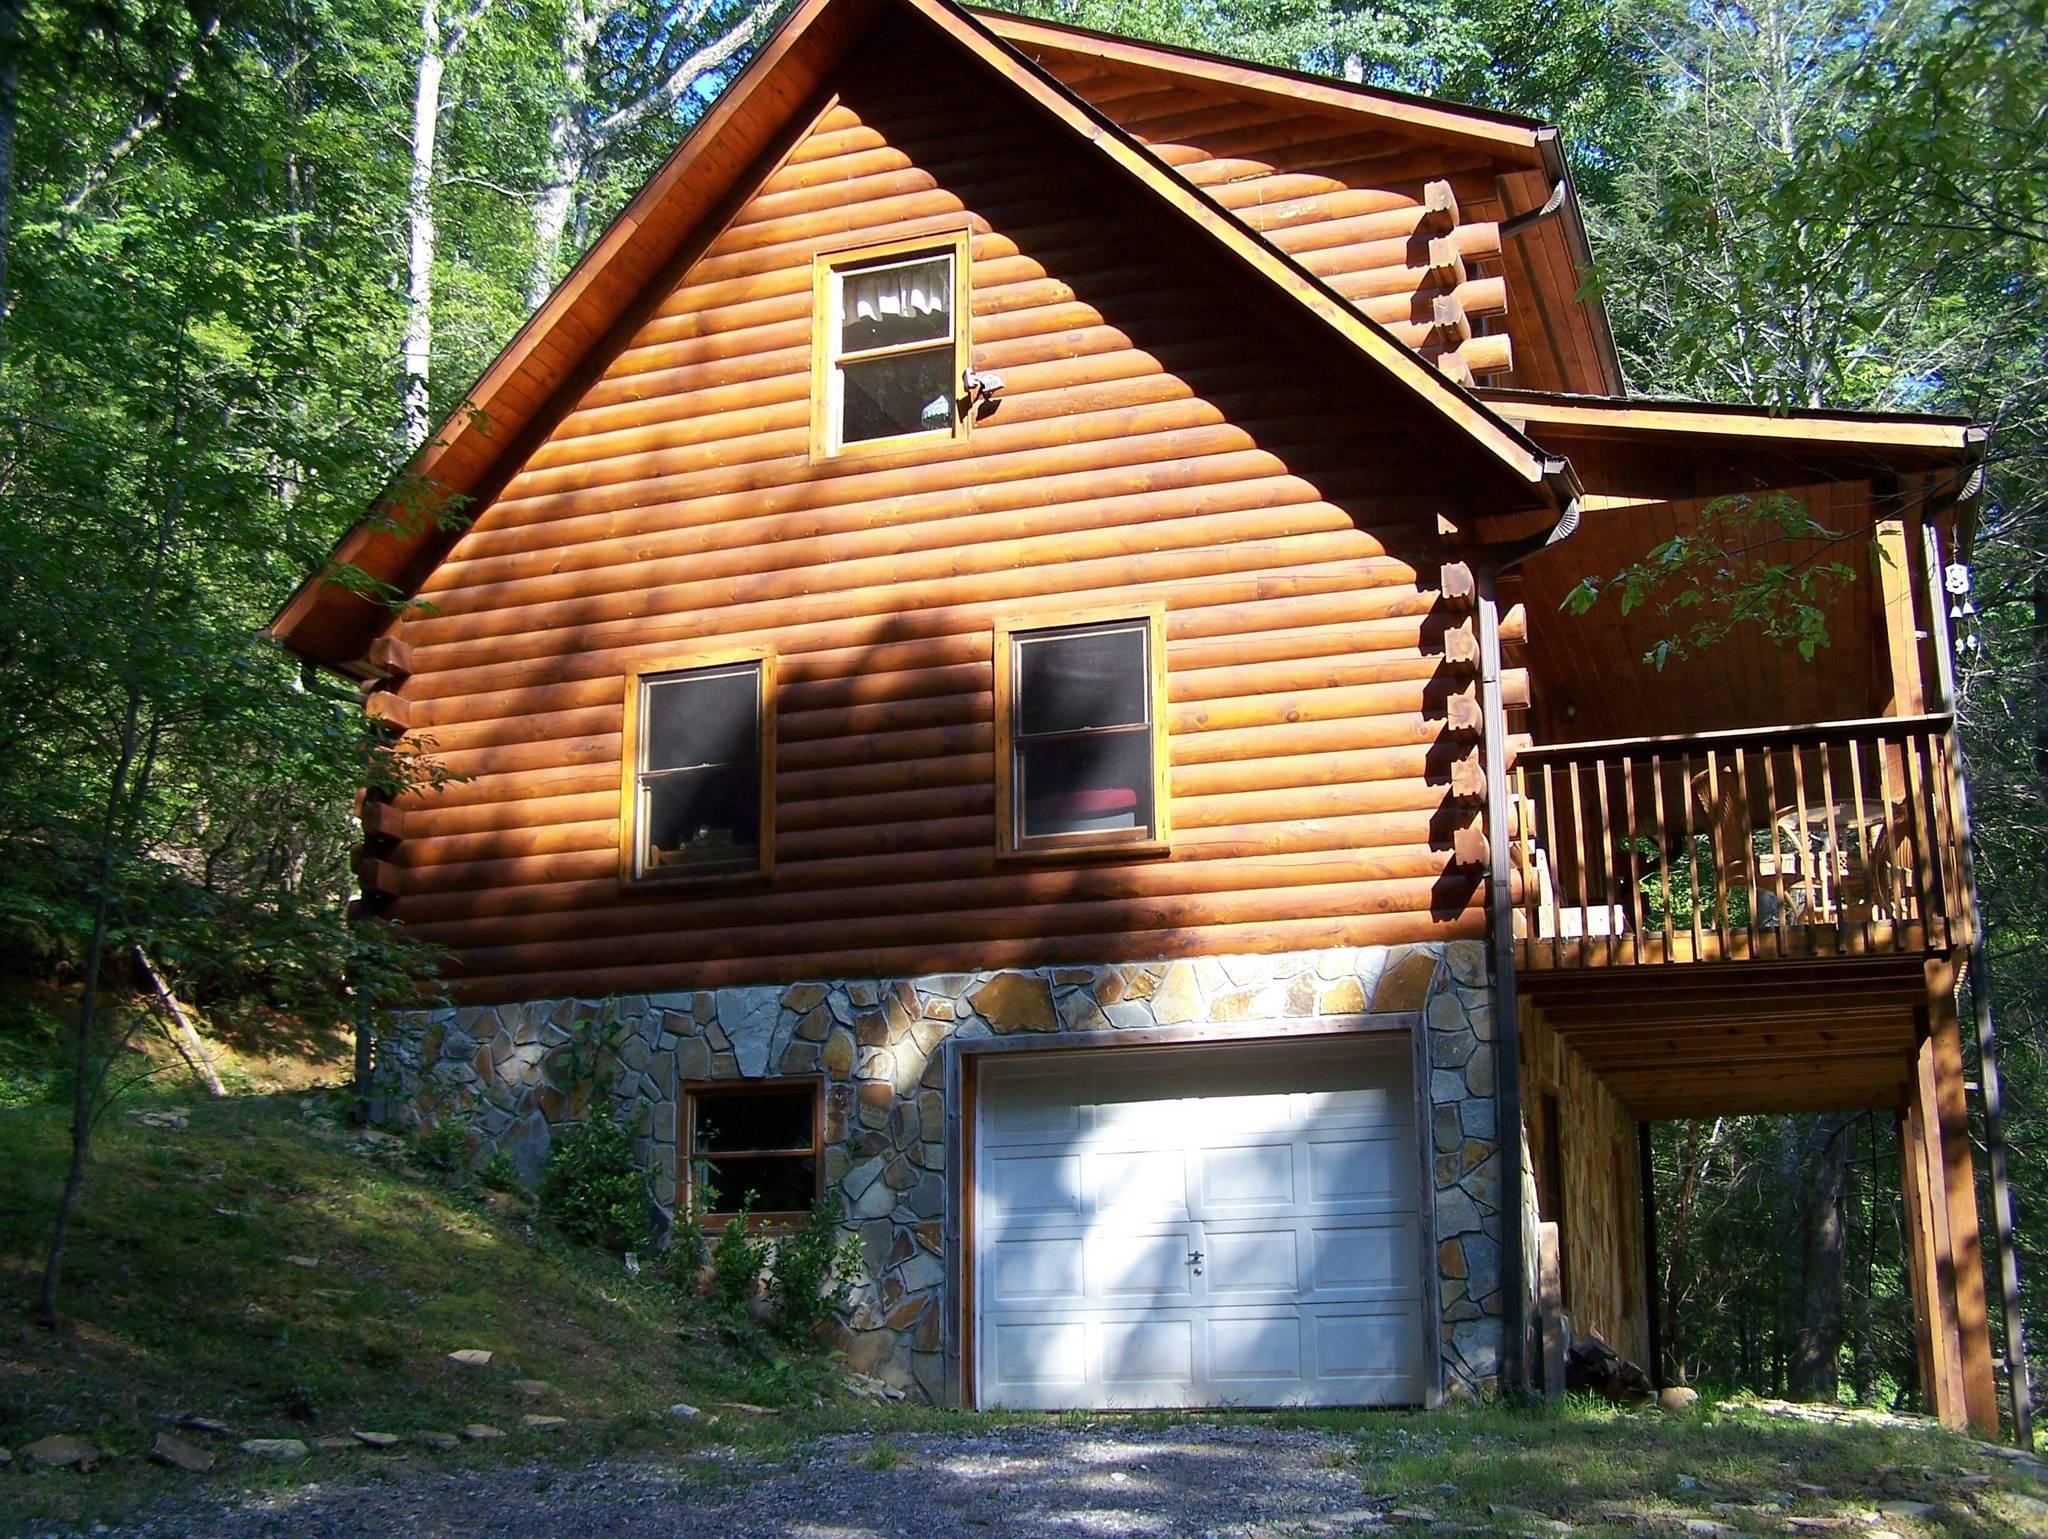 Skip S Bearly Rustic Cabin Blairsville Ga Cabin Rental 10 Guests Under 140 A Night Enchanted Mountain Retreats North Ga Cabin Rentals